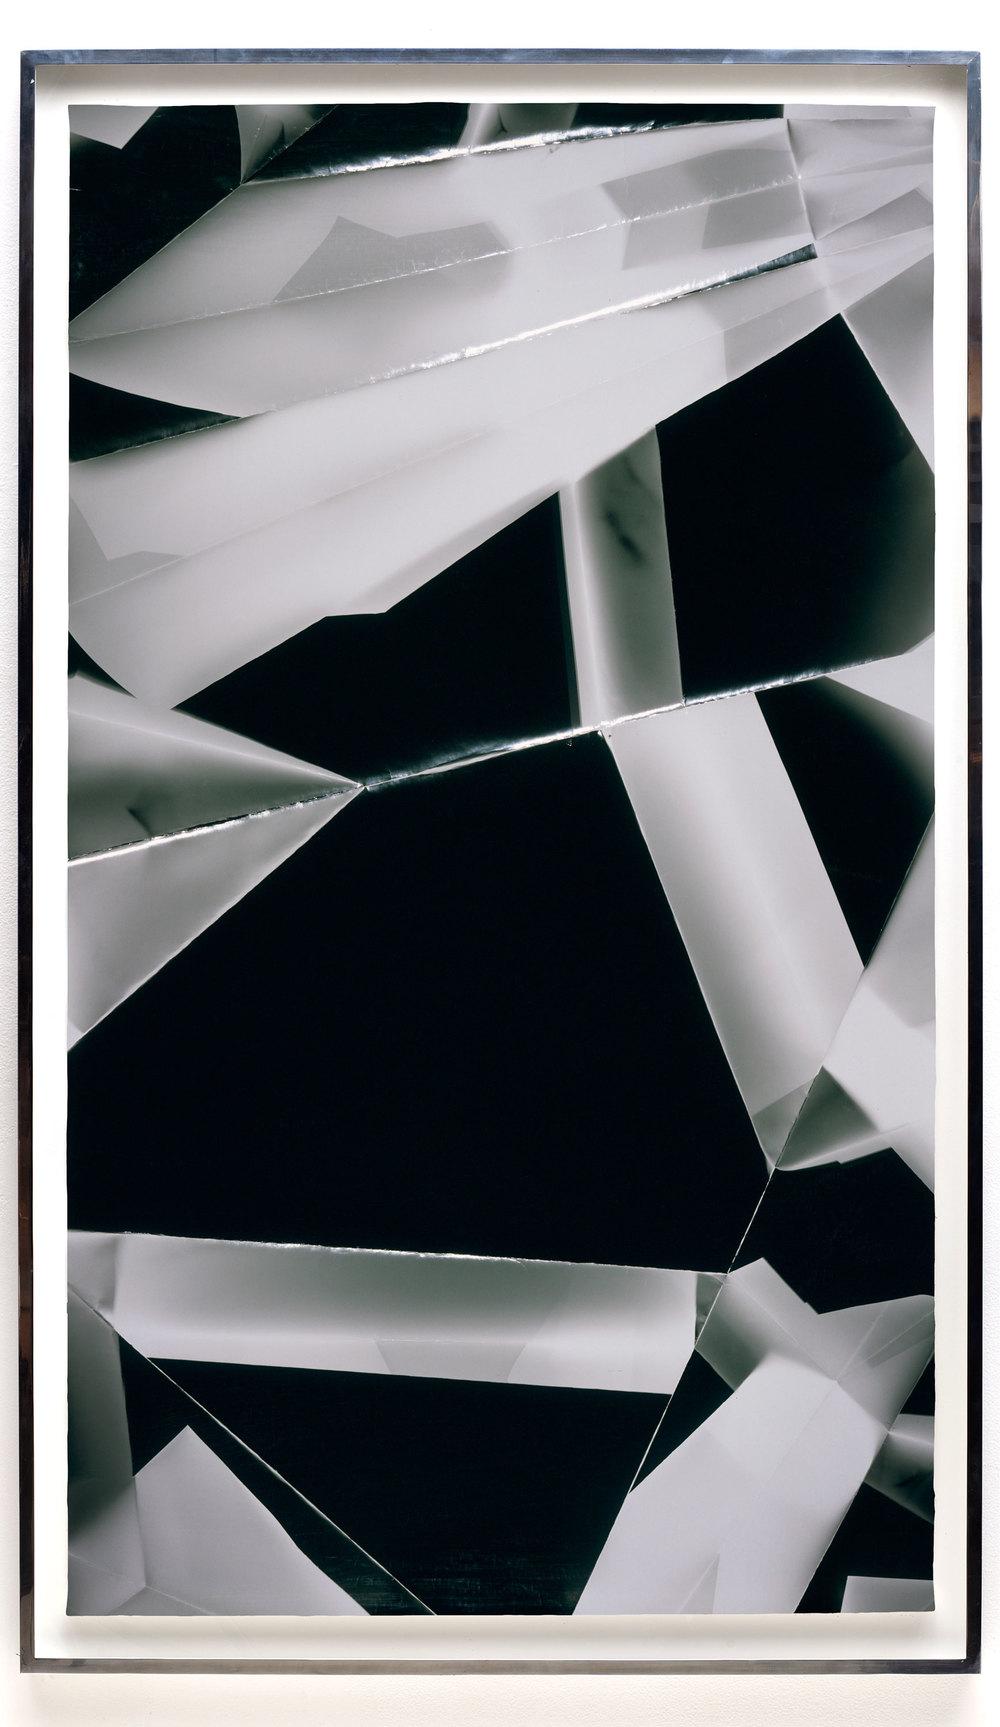 Fold (60º/120º/180º/240º/300º/360º directional light sources), June 30, 2008, Annandale-On-Hudson, New York, Foma Multigrade Fiber    2009   Black and white fiber based photographic paper  80 3/4 x 46 3/4 inches   Legibility on Color Backgrounds, 2009